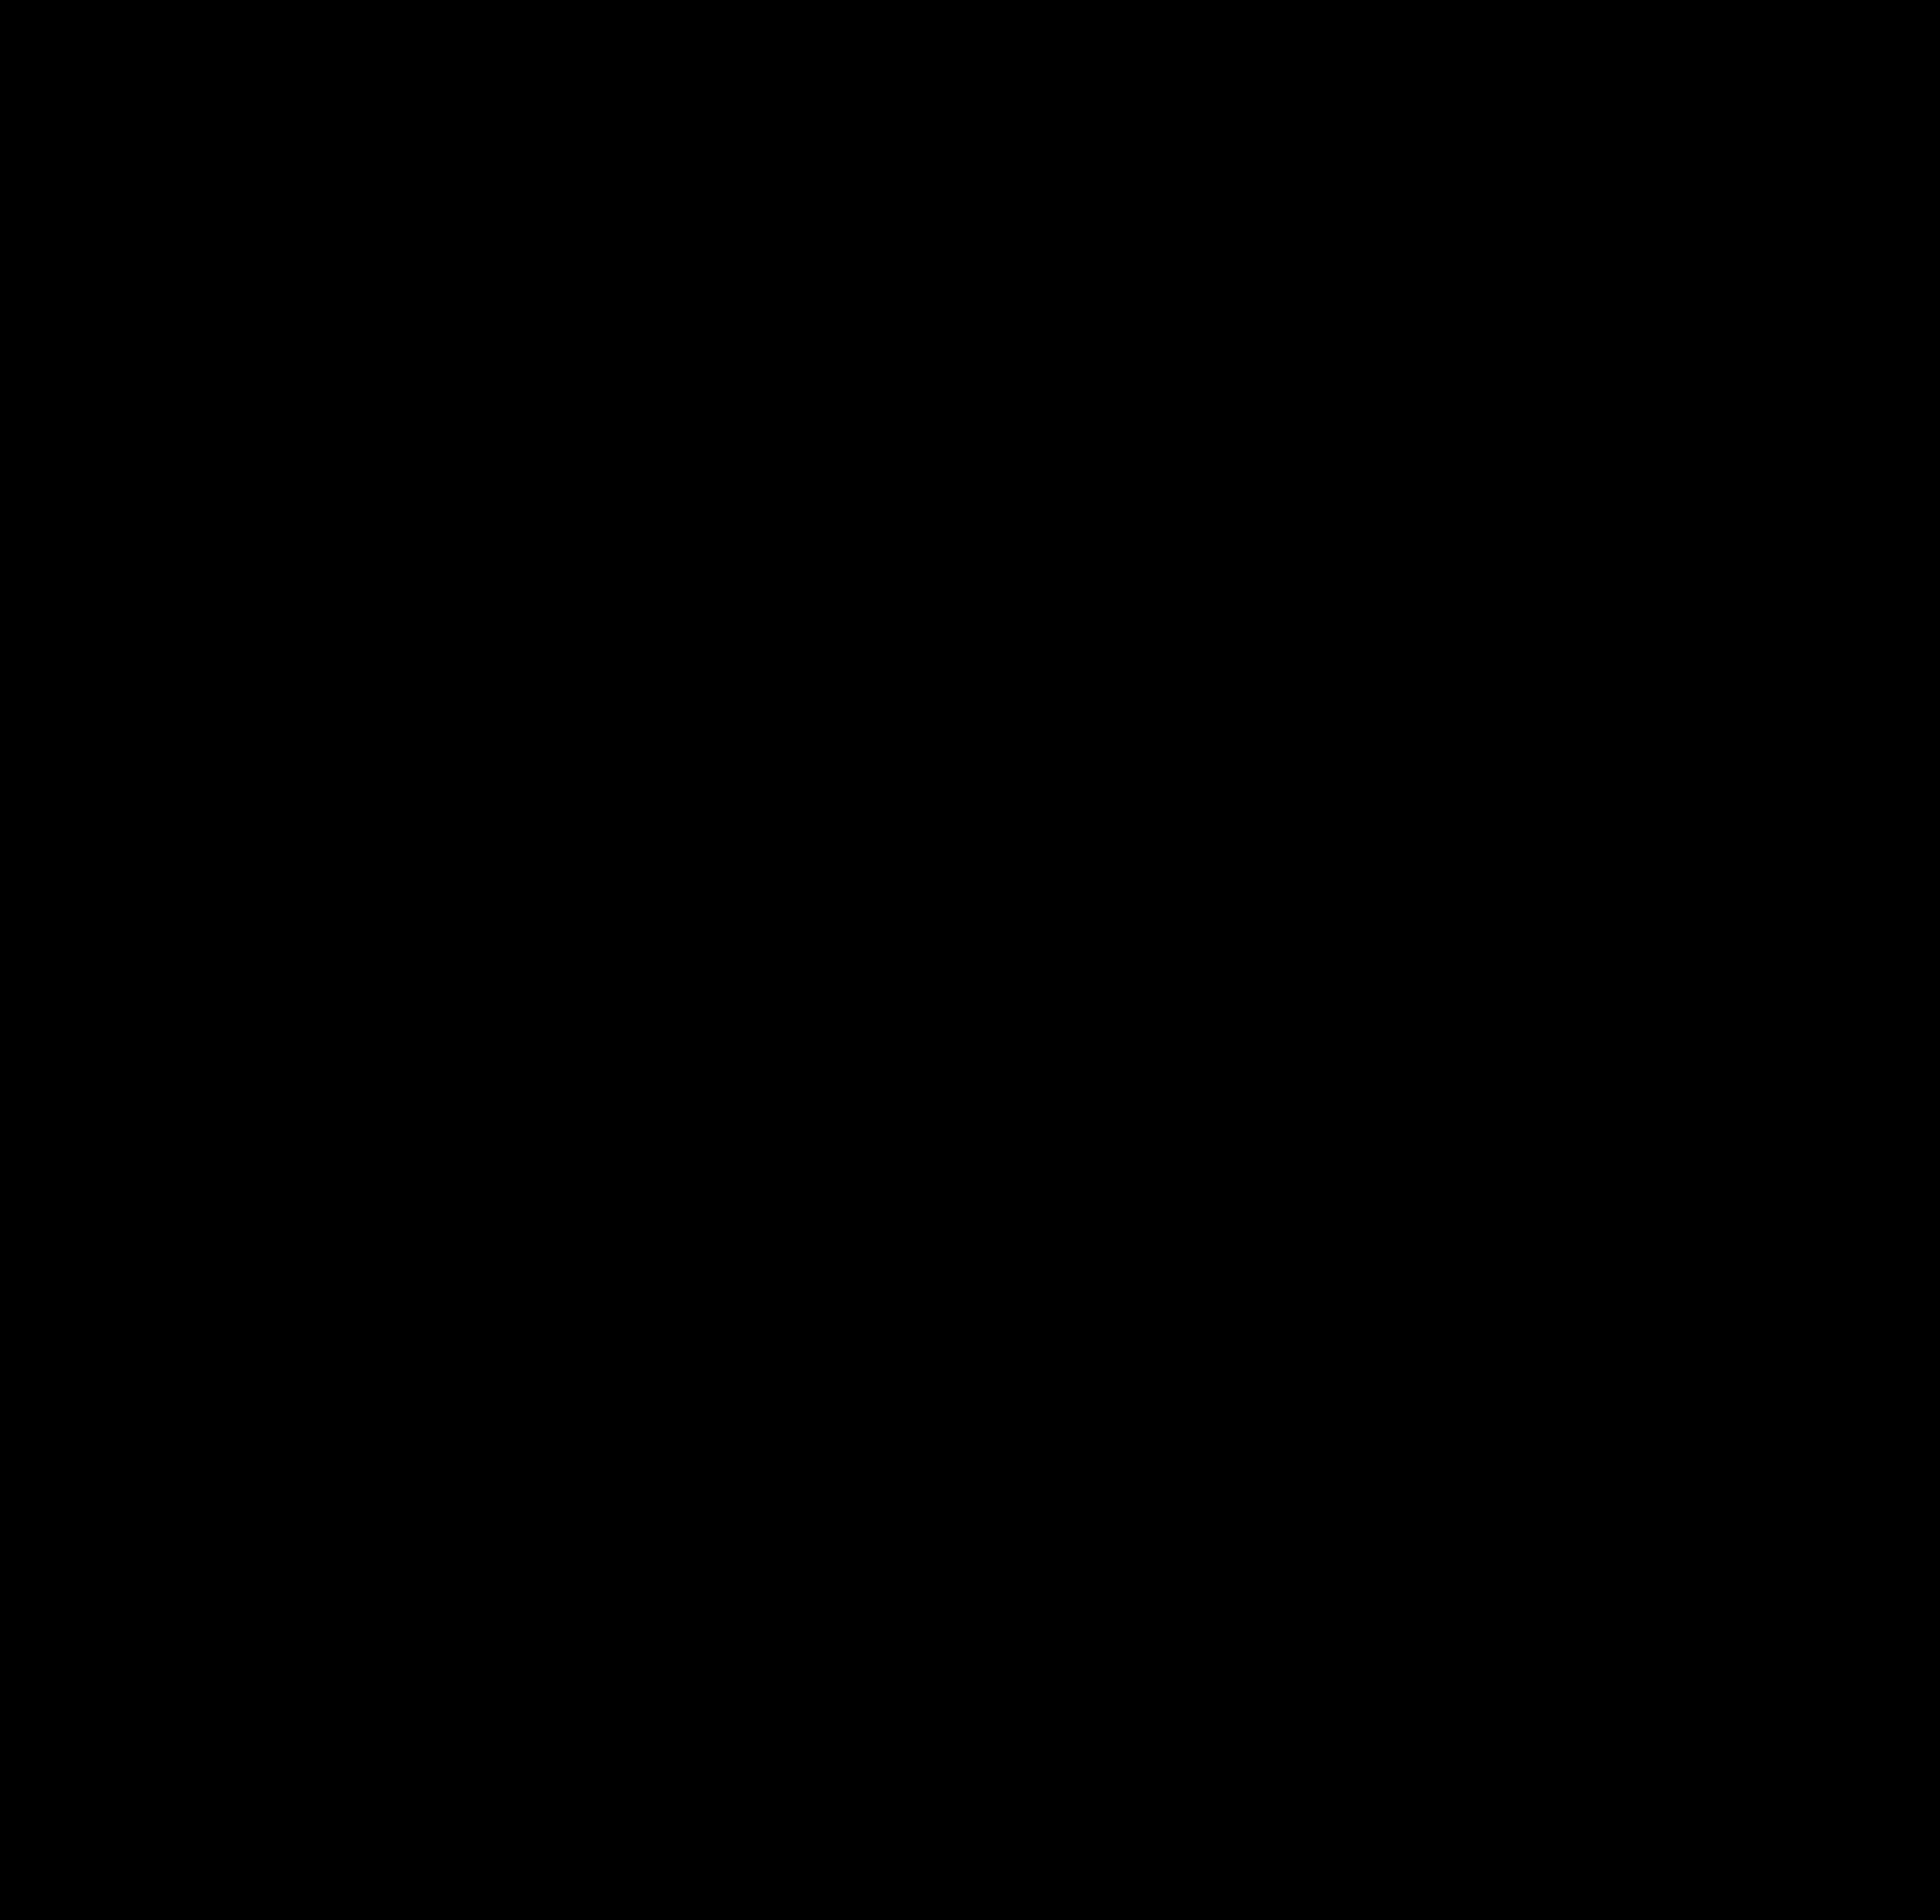 Flower Outlines Printable BIG IMAGE (PNG)